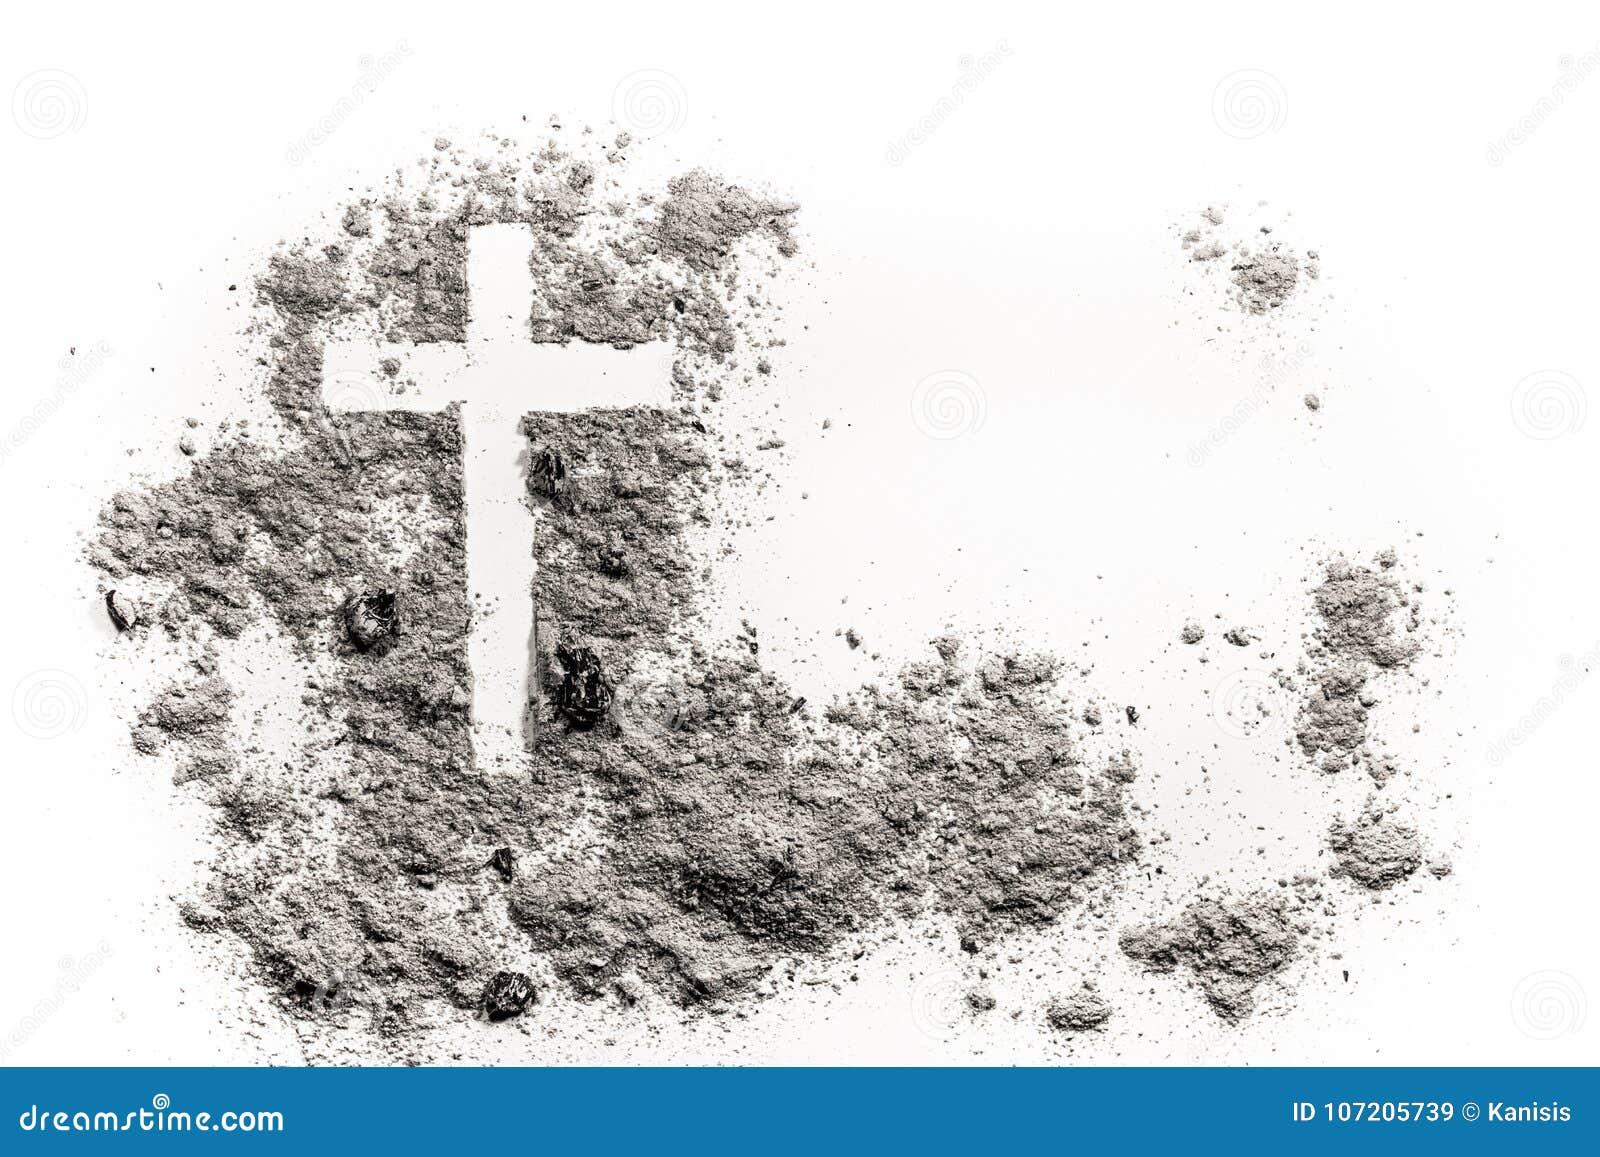 Christelijke kruis of kruisbeeldtekening in as, stof of zand